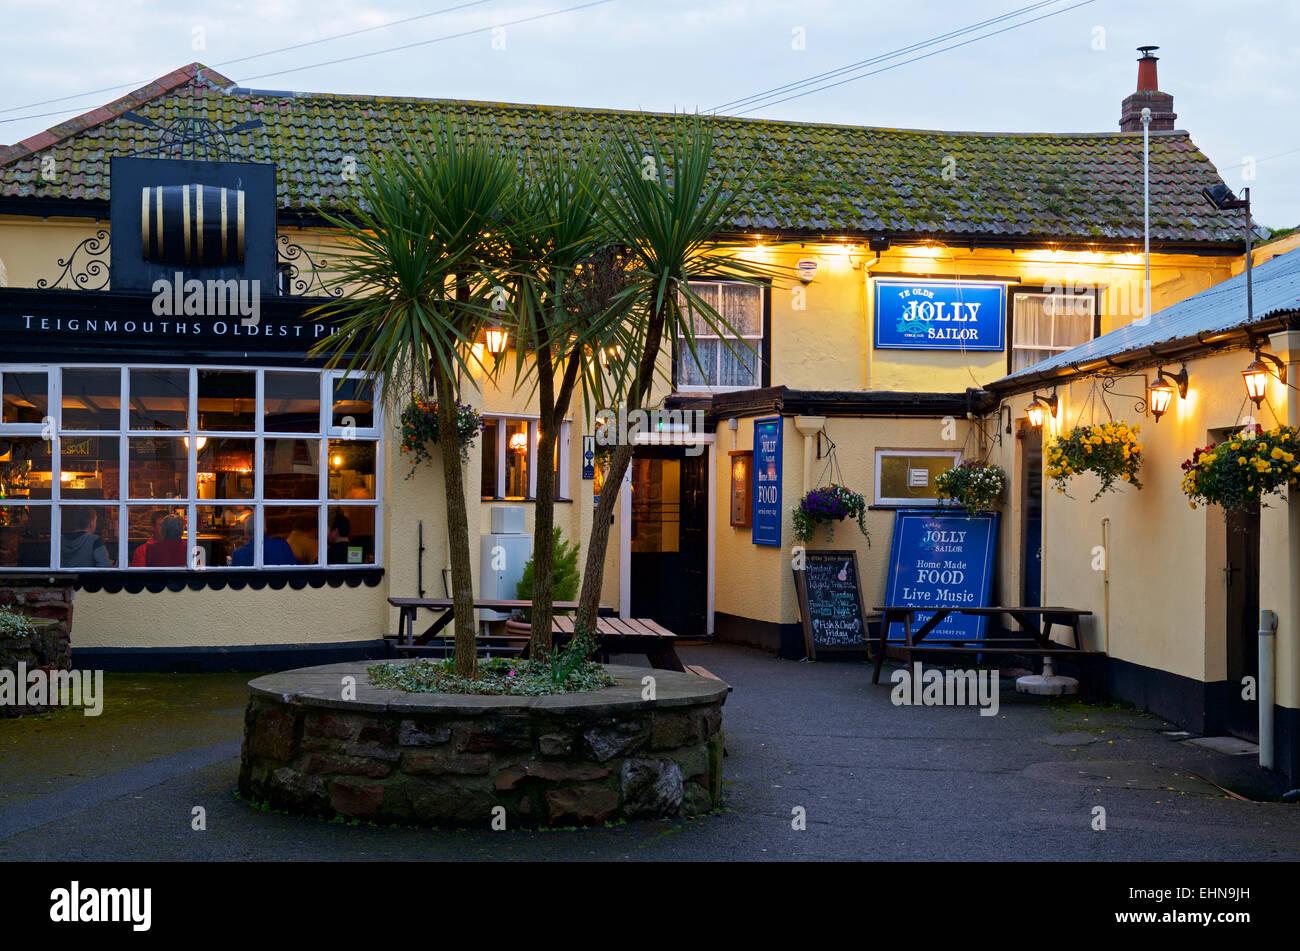 The Jolly Sailor pub in Teignmouth, Devon, England UK - Stock Image